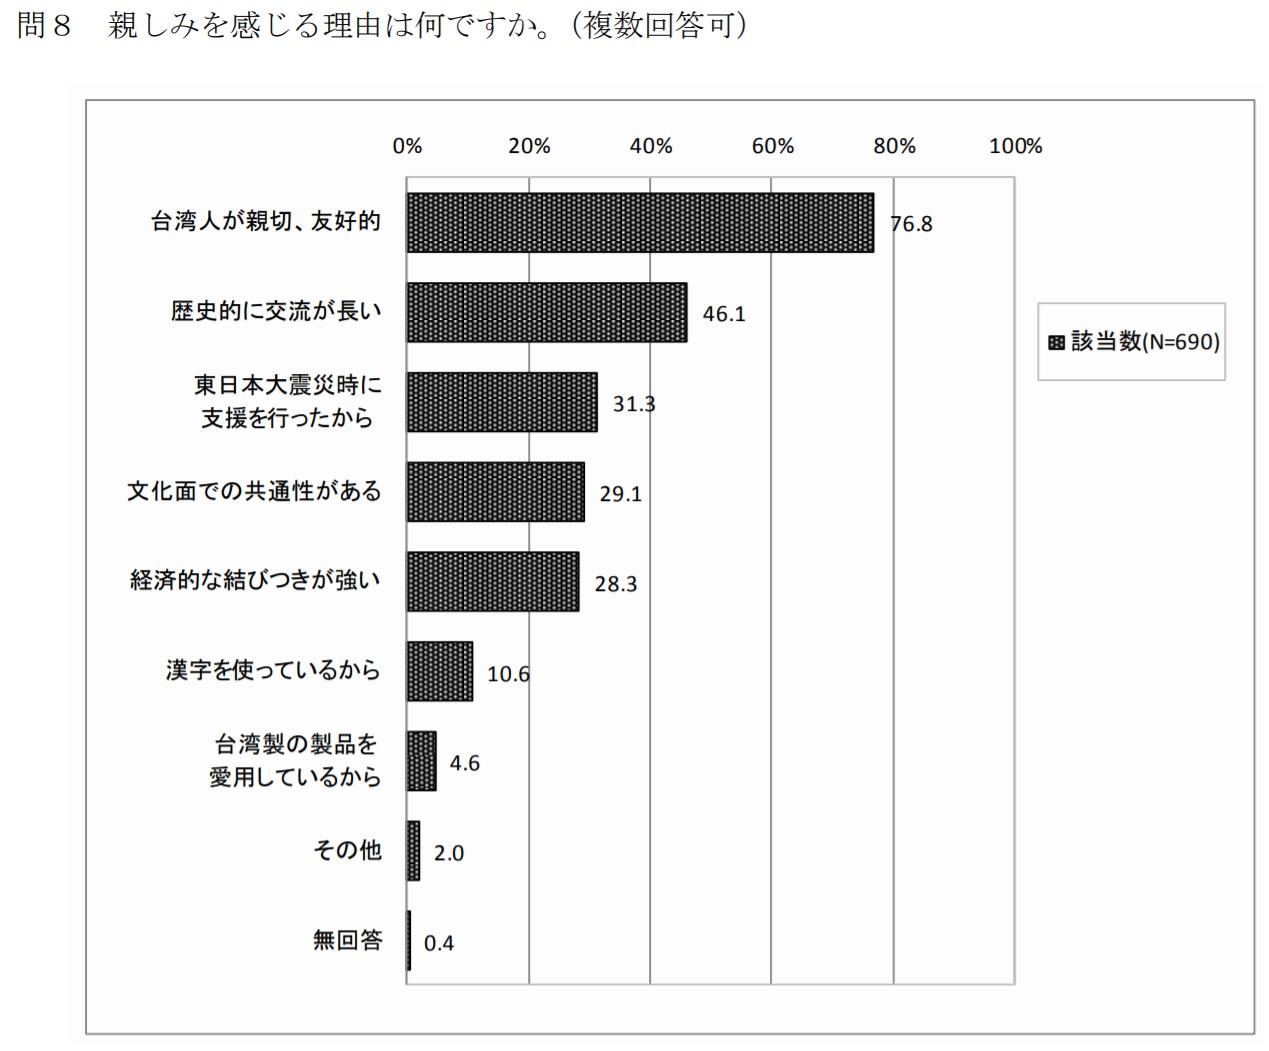 圖片擷取自「2017台湾に対する意識調査報告書」